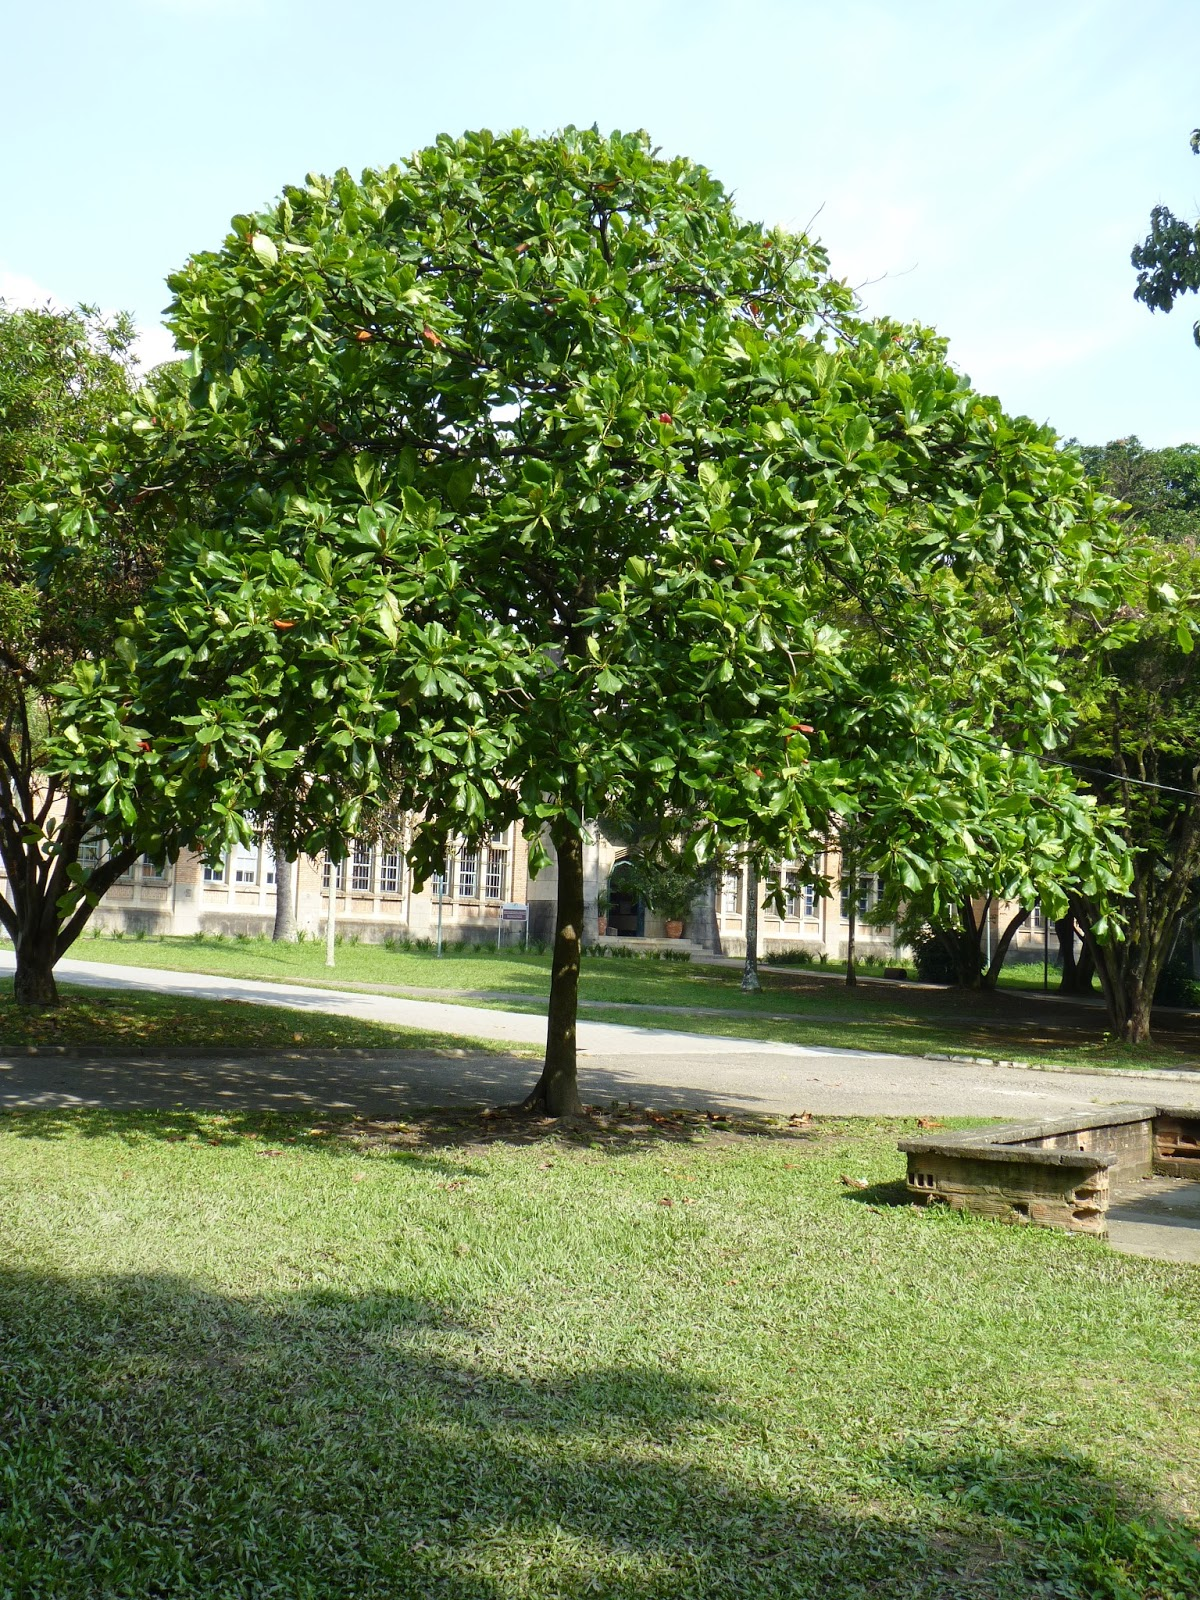 Arboretum diciembre 2015 almendro for Arboles para sombra de poca raiz